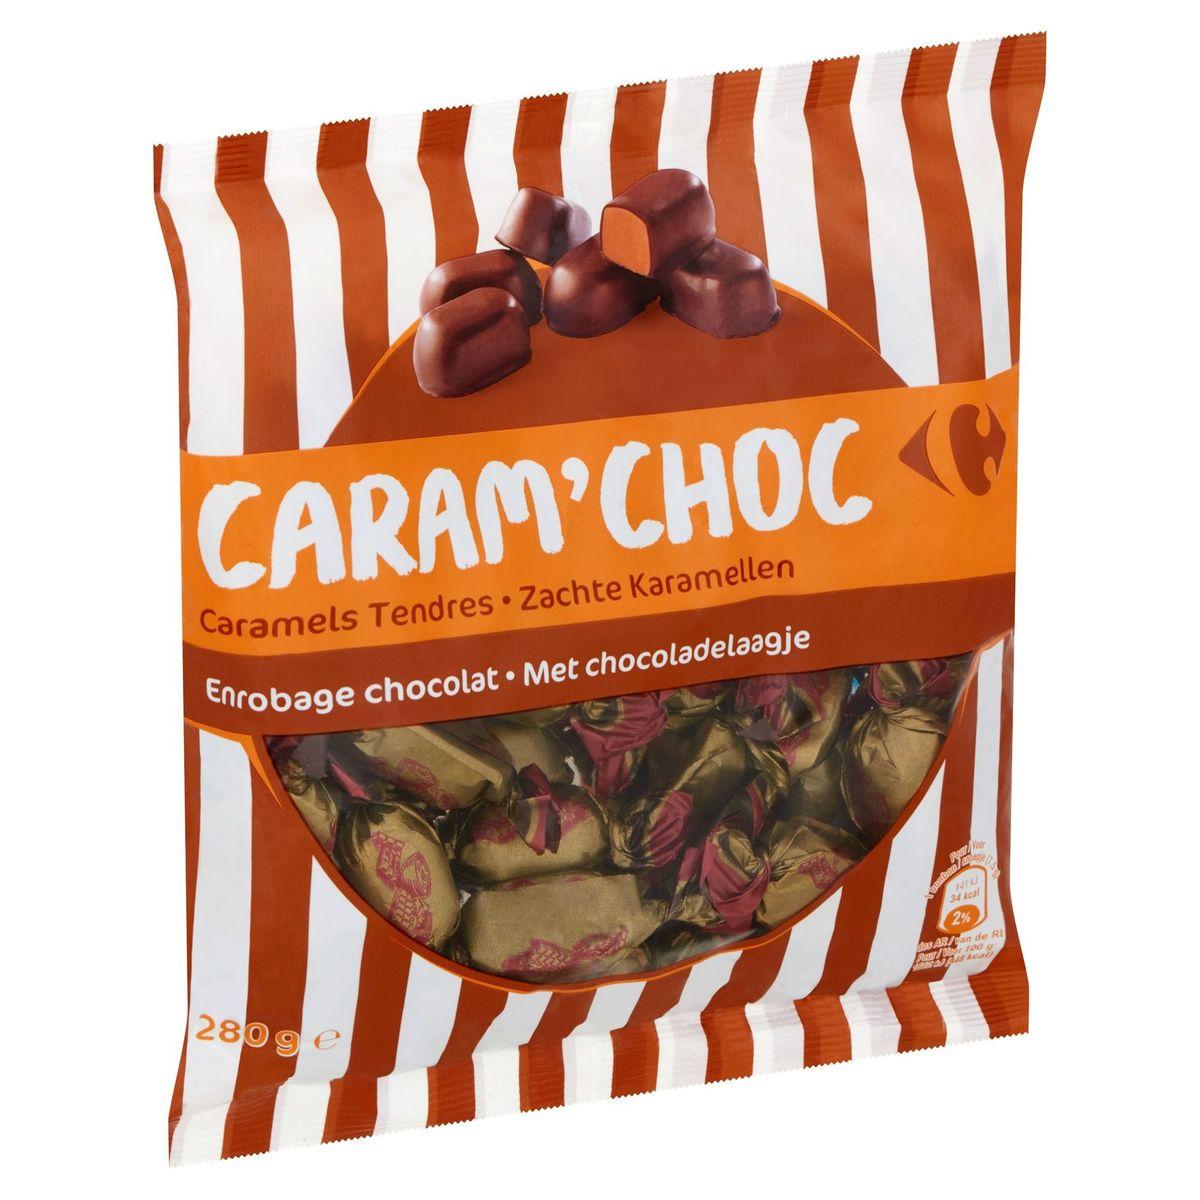 Carrefour Caram' Choc Zachte Karamellen met Chocoladelaagje 280 g